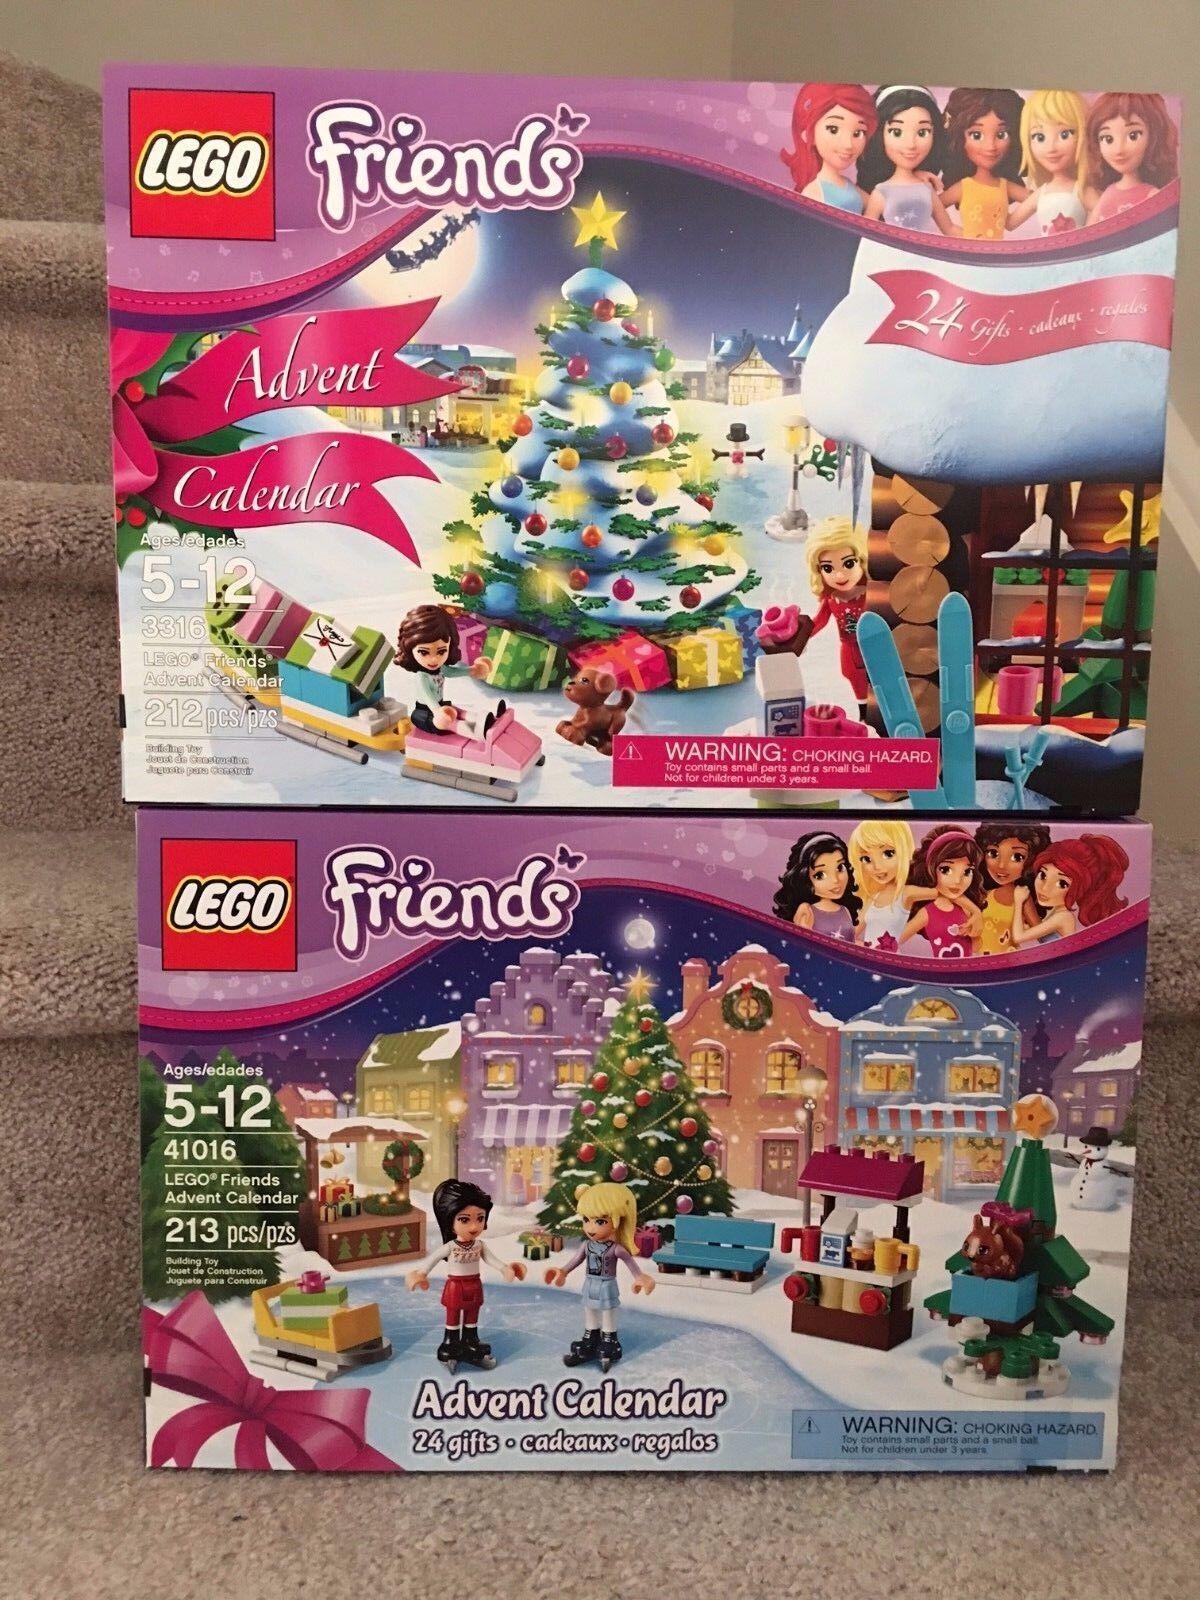 2 NEW Lego Friends Advent Calendar 3316 41016 , SEALED